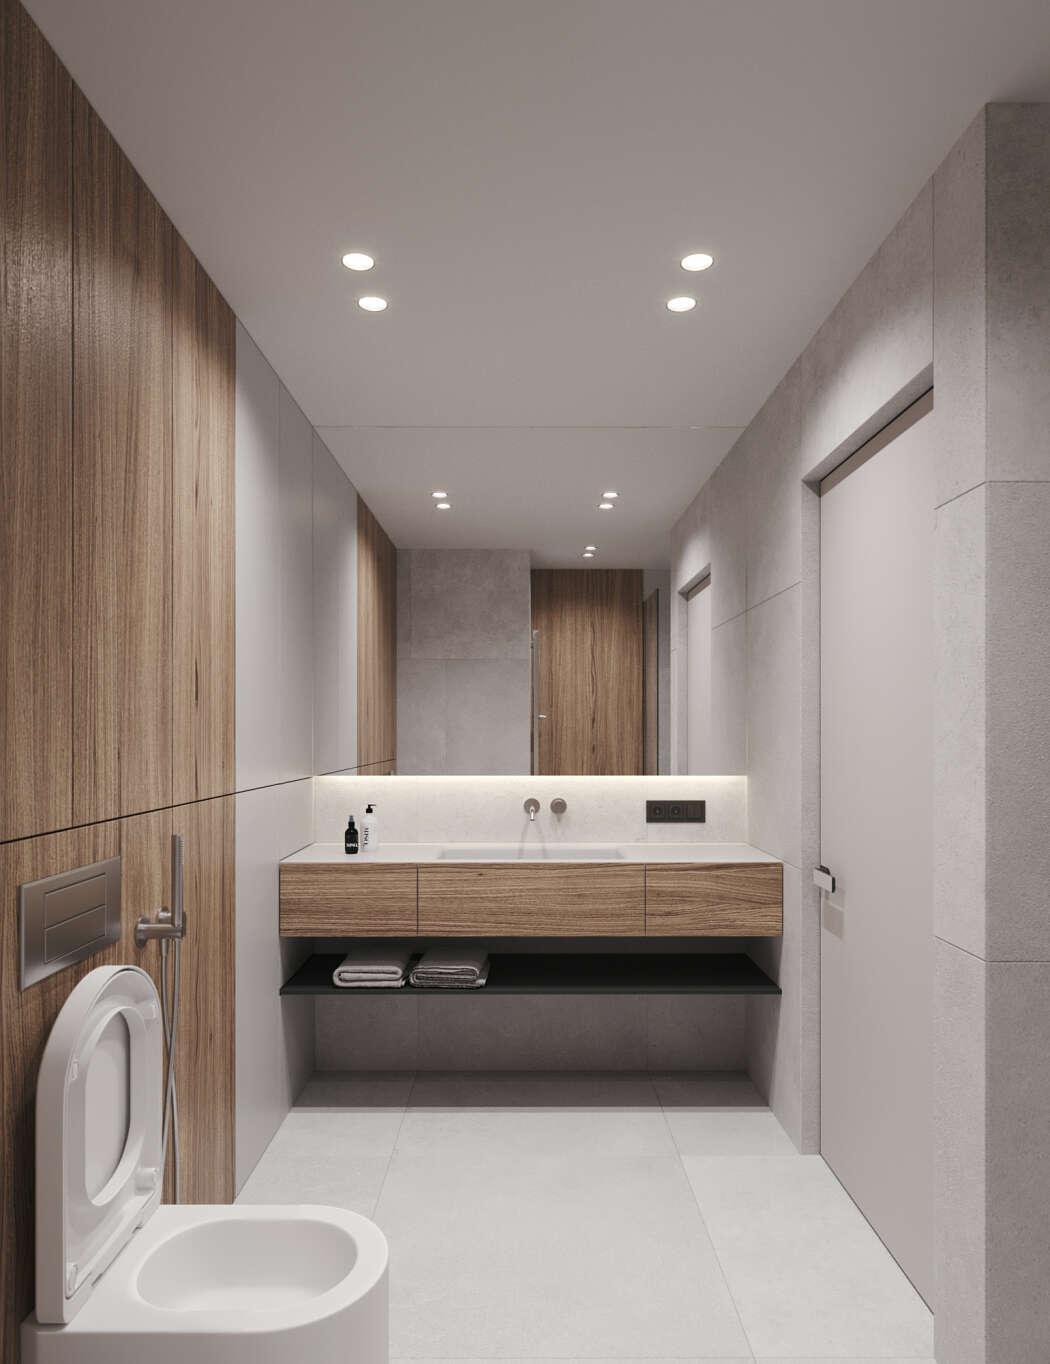 Mooie, strakke, moderne en minimalistische badkamer